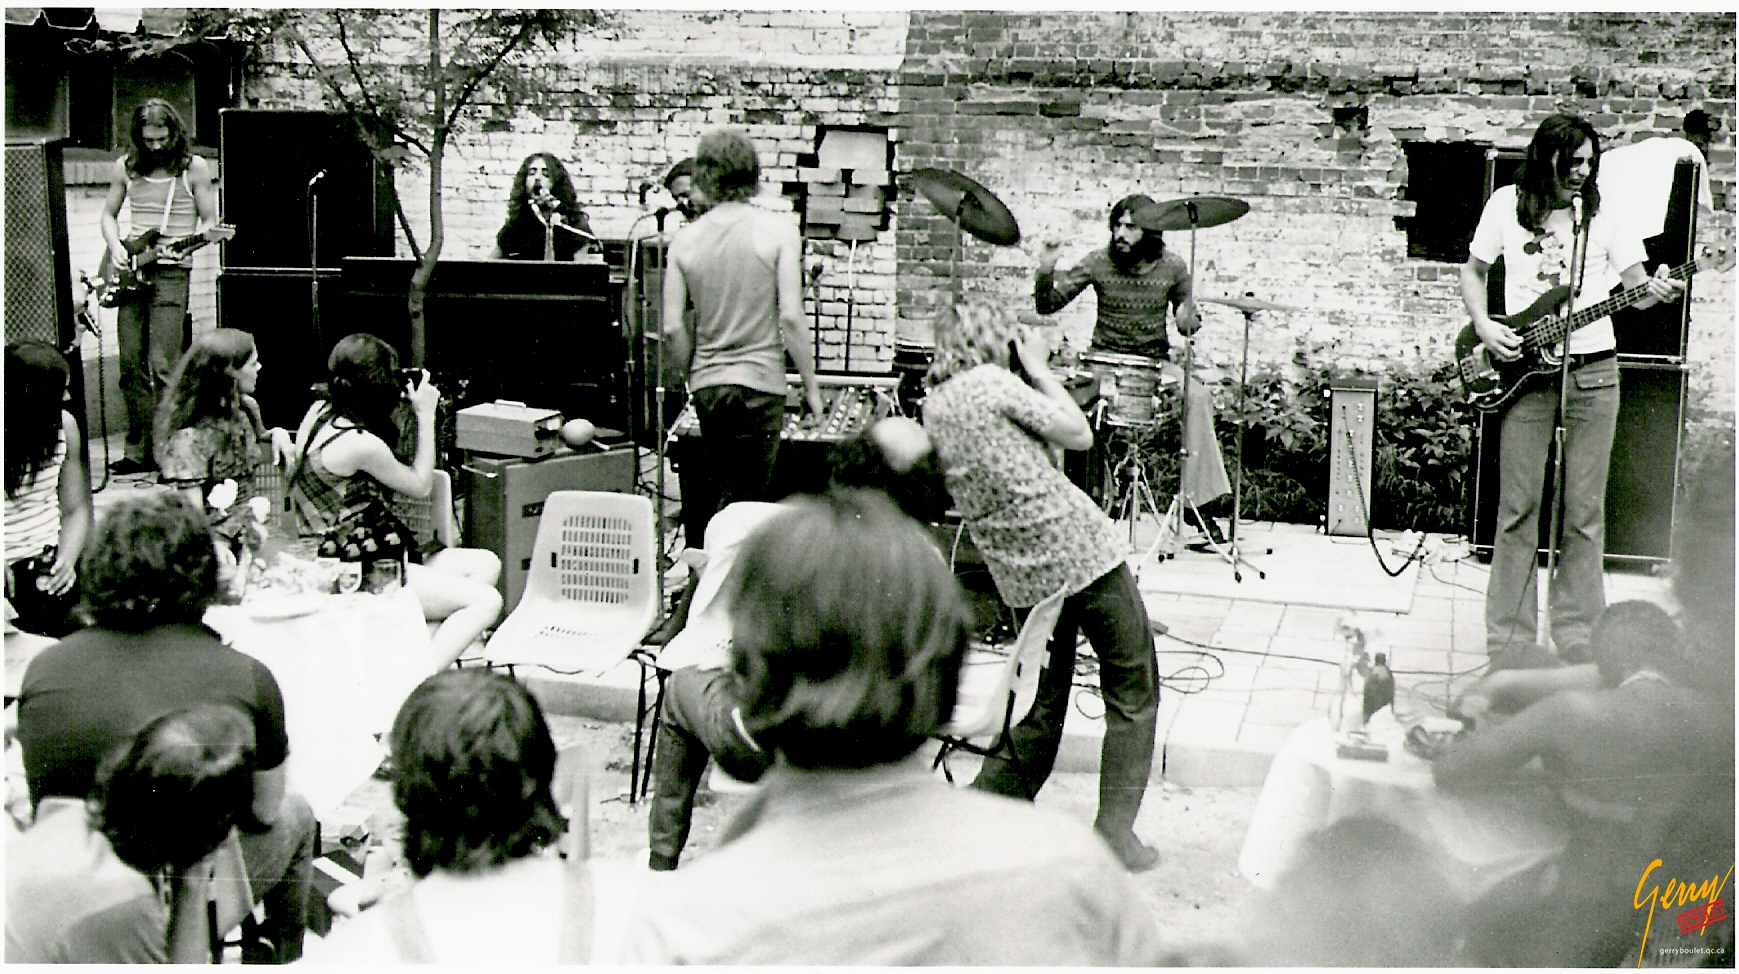 02-hotel nelson-2-lancement de soap opera-1972